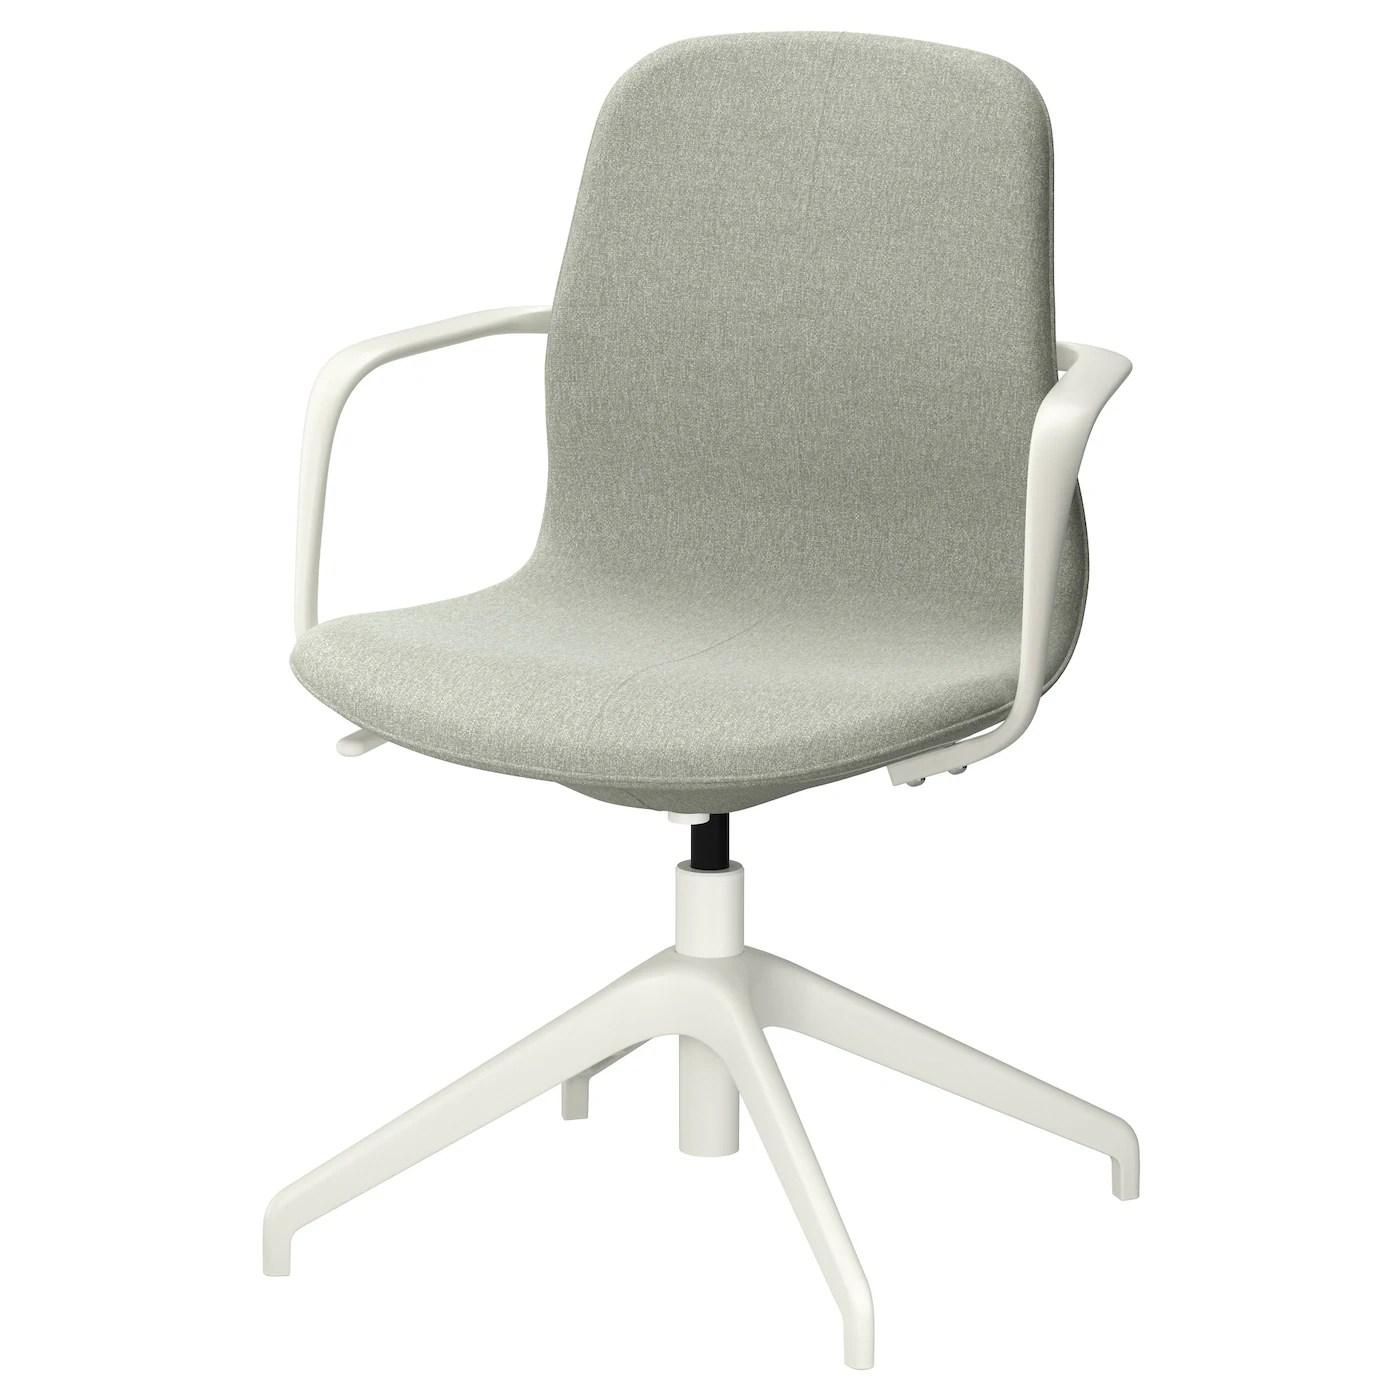 zone swivel chair upholstered dining chairs set of 6 chaise bureau ikea markus  ciabiz